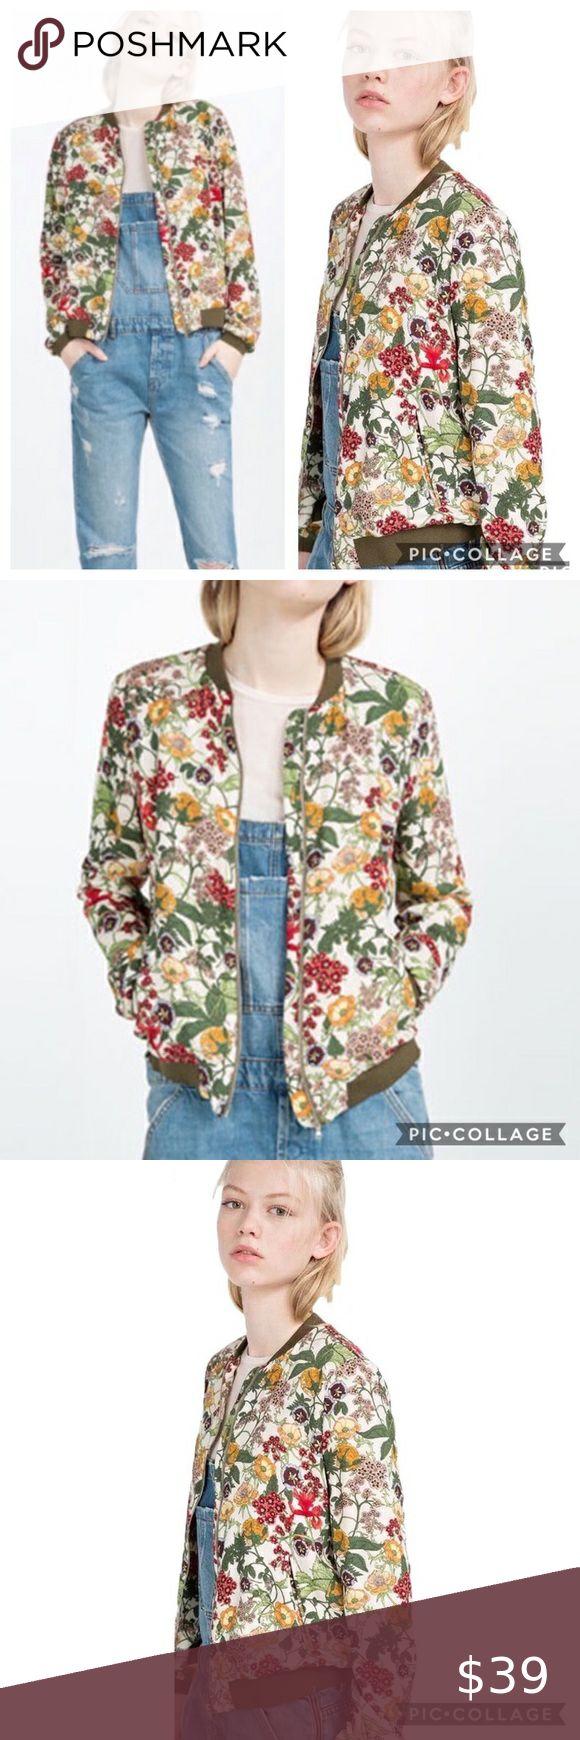 Zara TRF Outerwear Floral Bomber Jacket in 2020 Floral